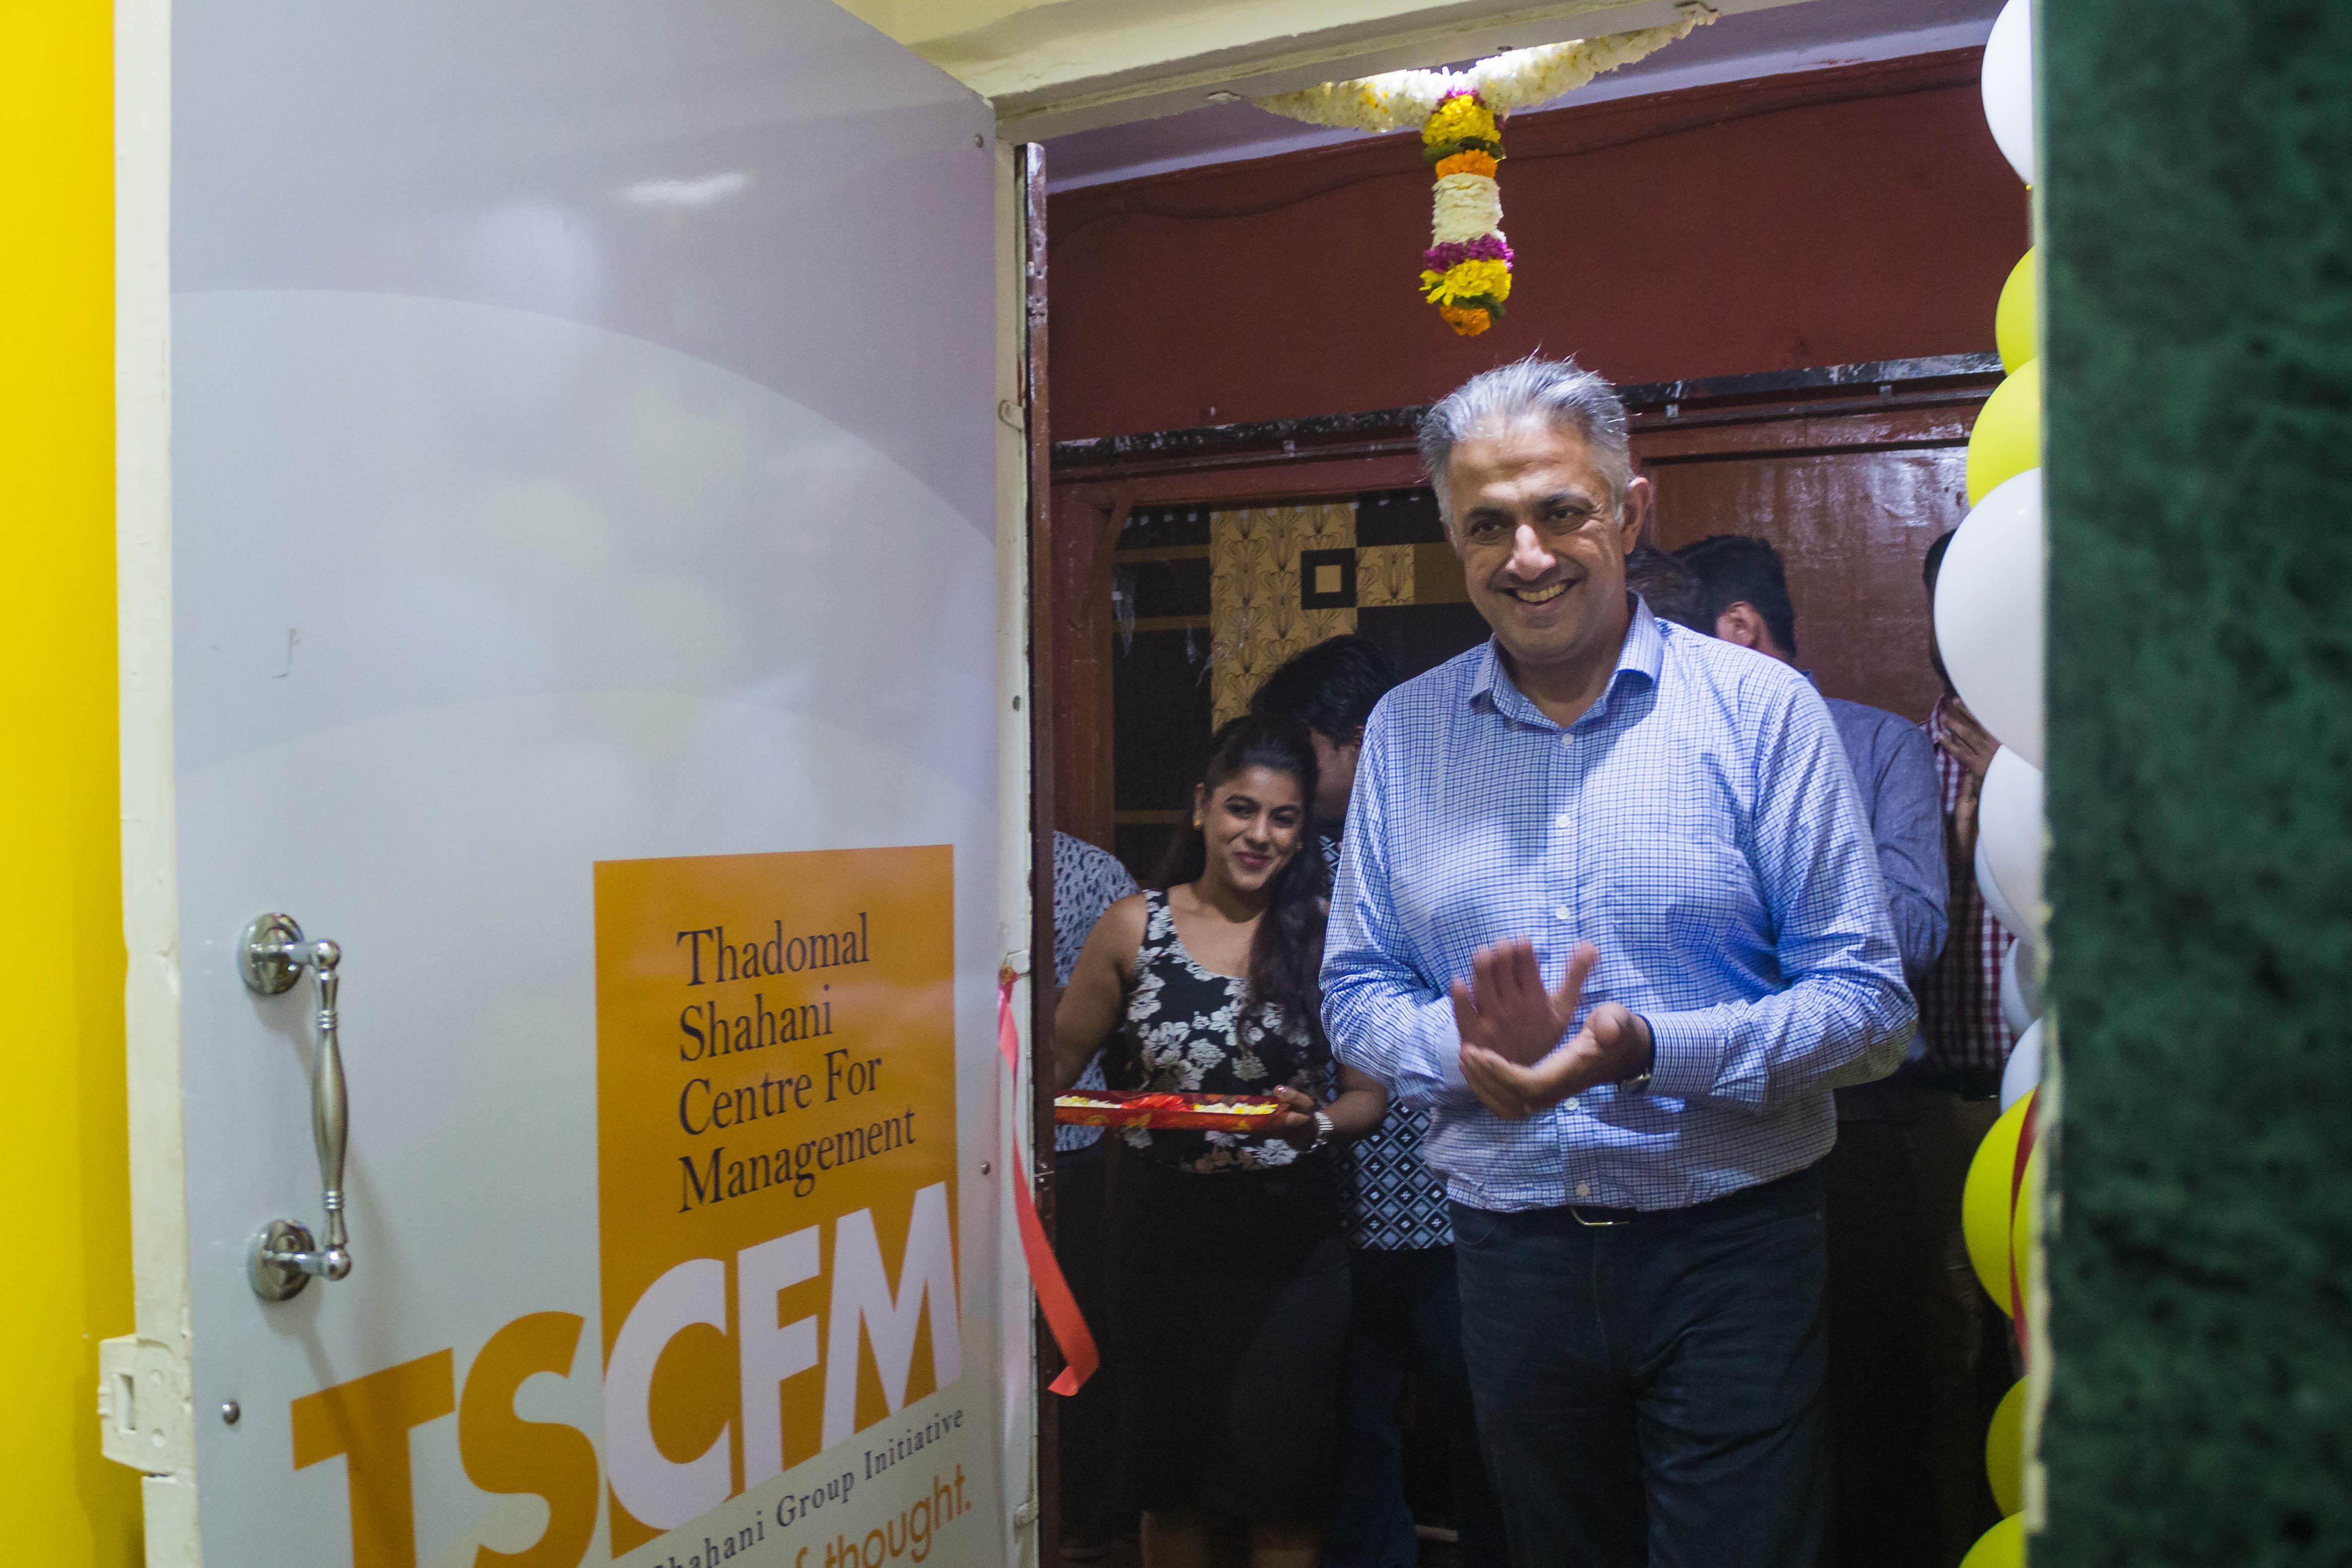 Inauguration of TSCFMs new Franchise Centre